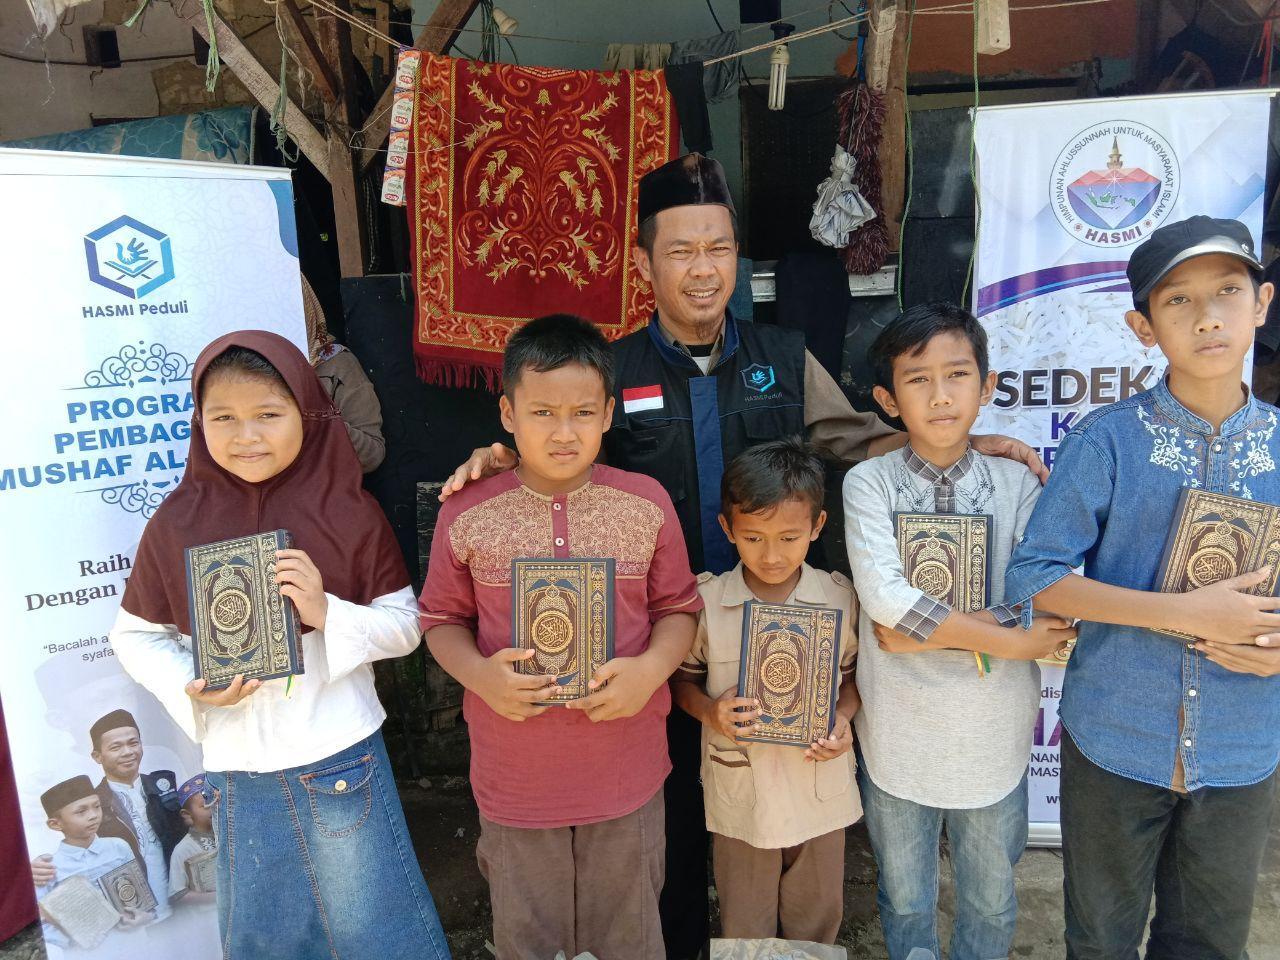 Wakaf Qur'an untuk Yatim di Kampung Kreteg Ciomas Bogor